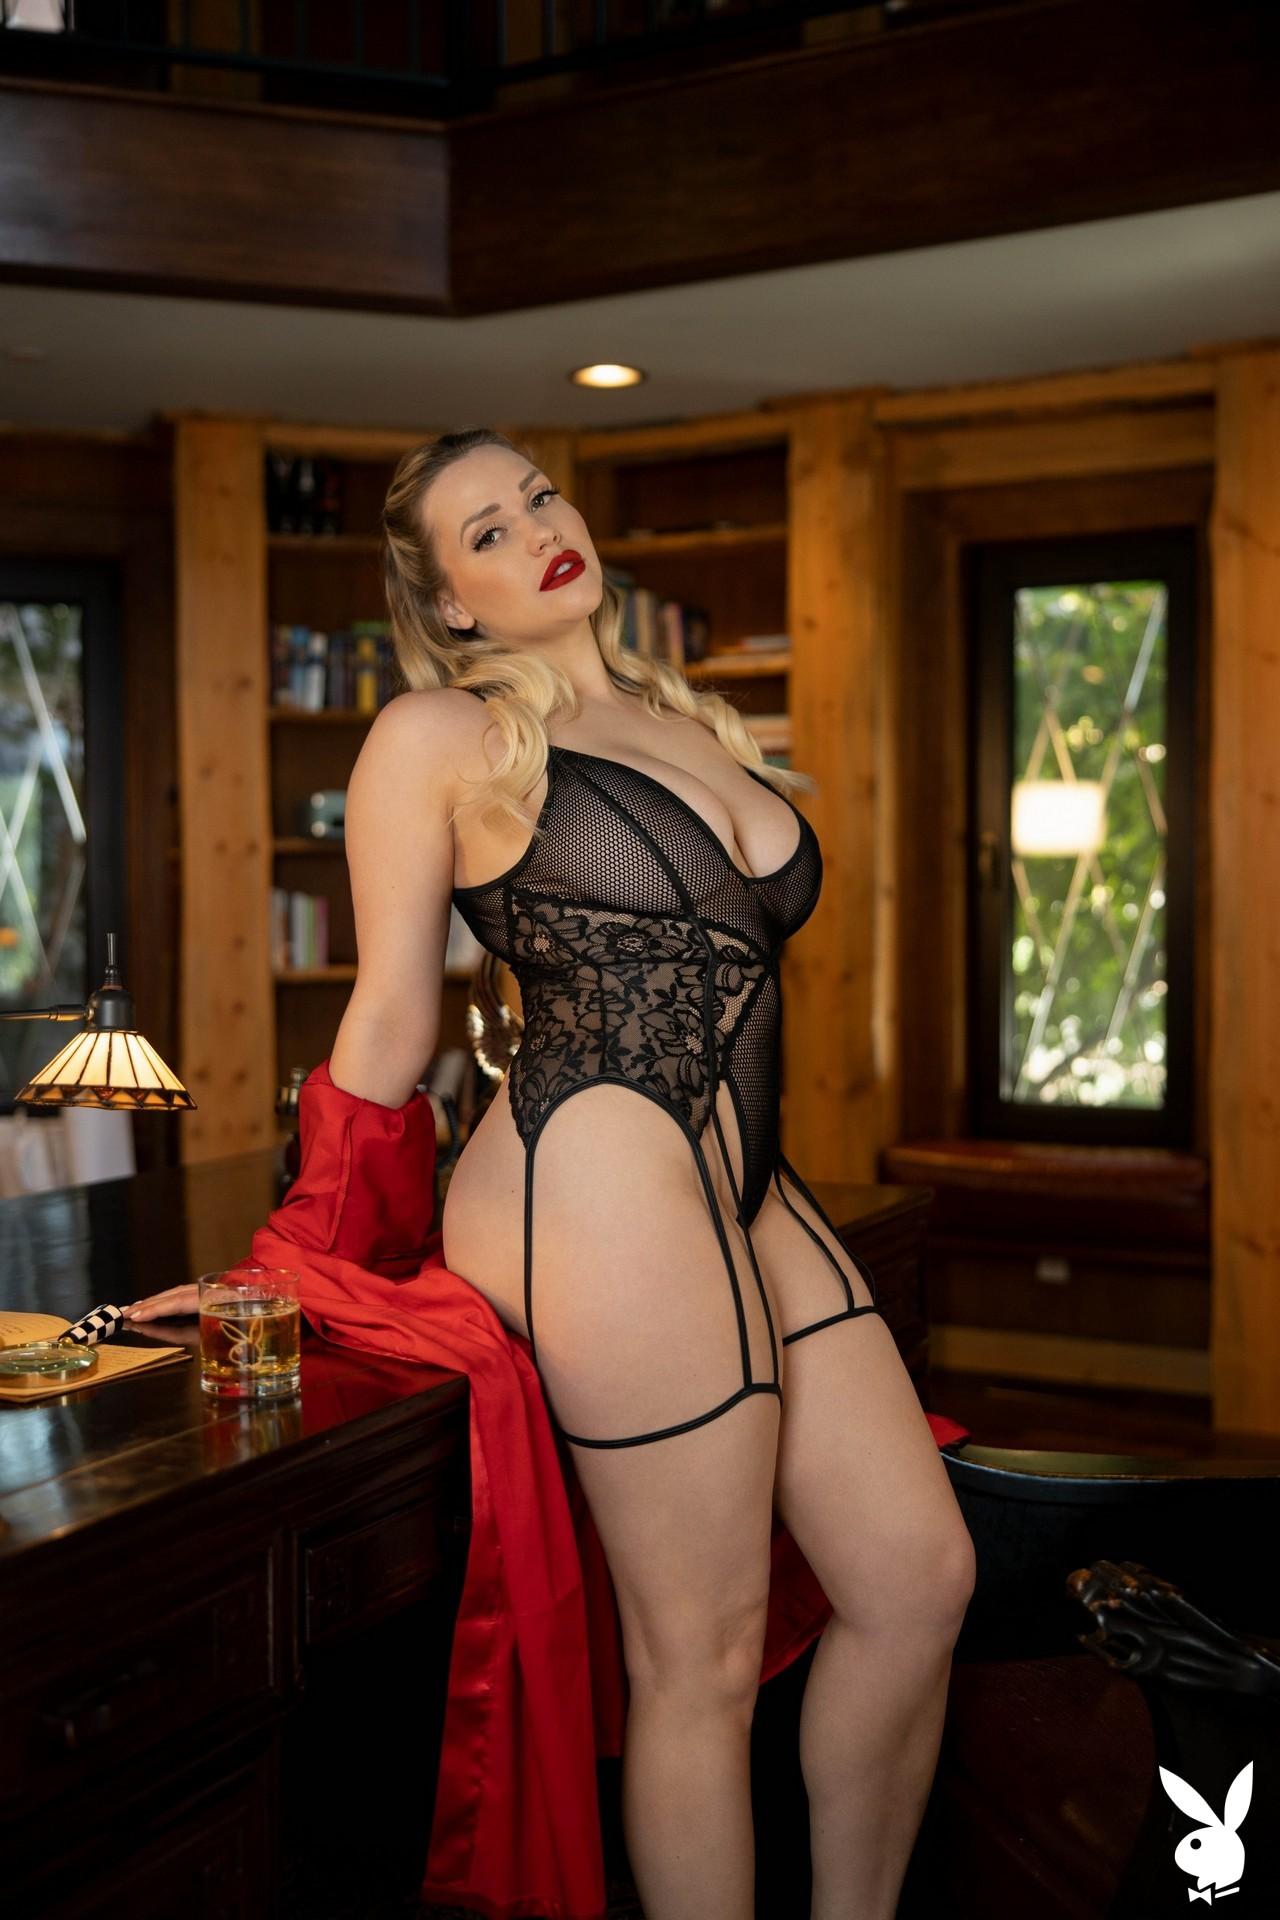 Mia Malkova In Off The Clock Playboy Plus (9)